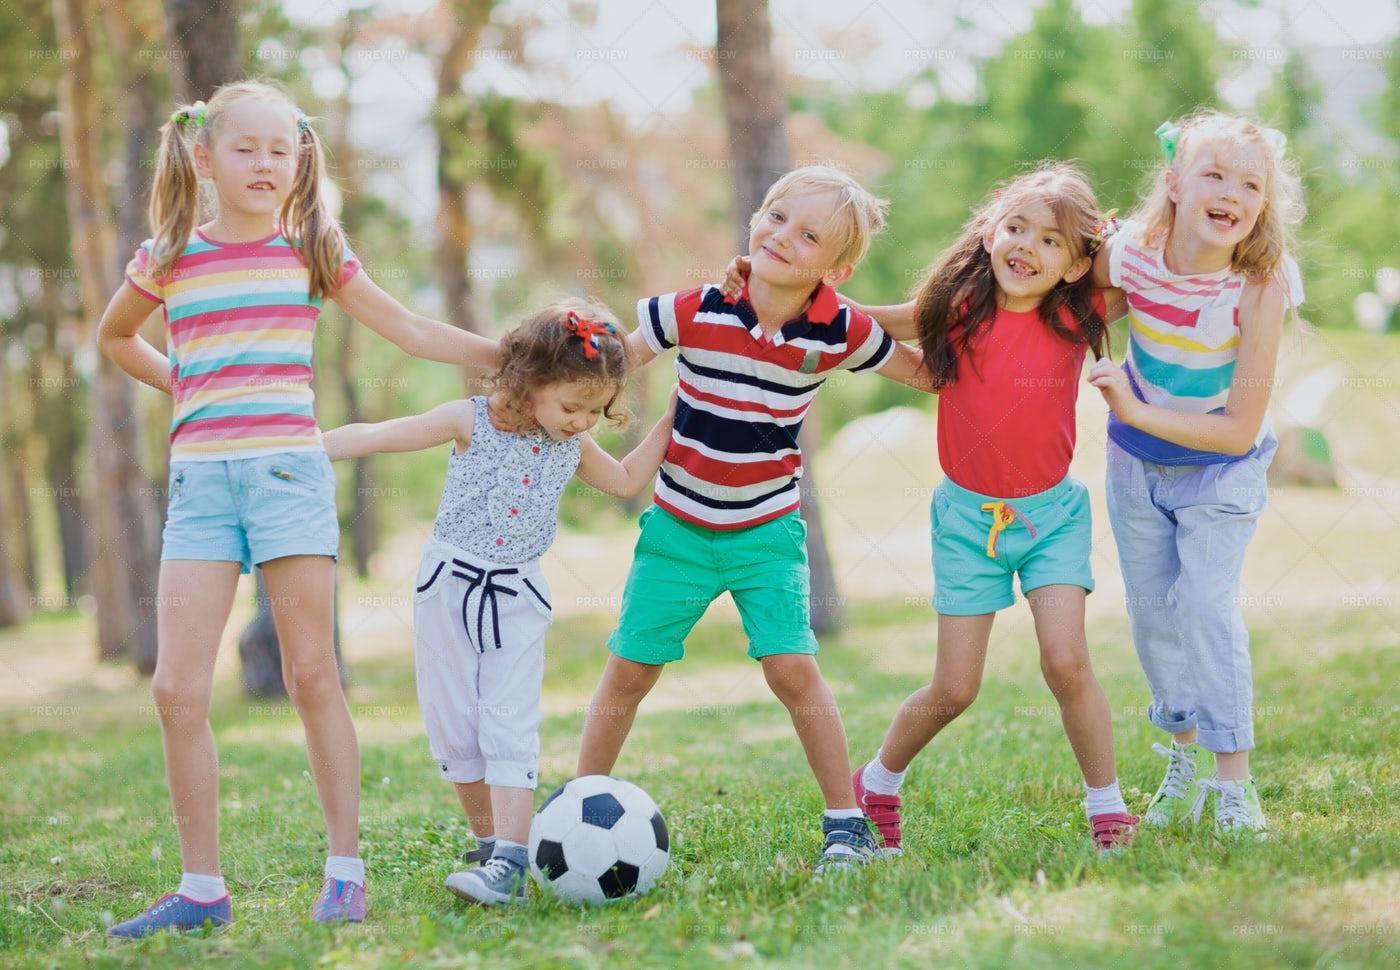 Happy Kids In Park: Stock Photos